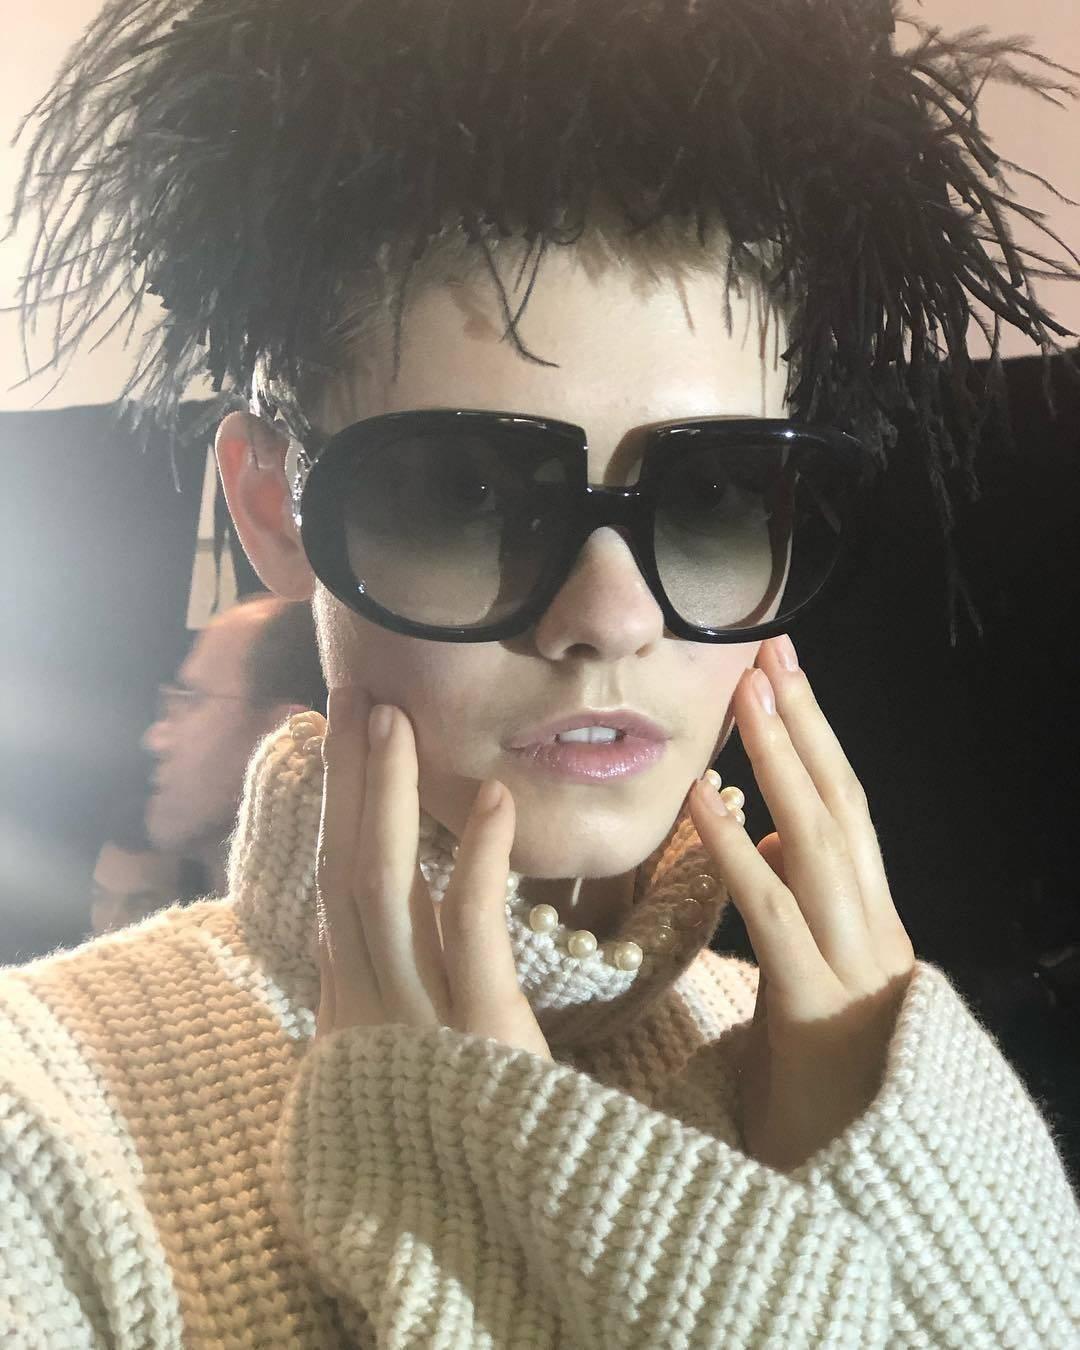 Assisting @mariannewman #nails @loewe . . #hair @guidopalau #makeup @patmcgrathreal  #bts #aw19 #pfw #pwf19 #cndworld #teammariannewman #manicurist #manicure #fashionweek #sessiontech